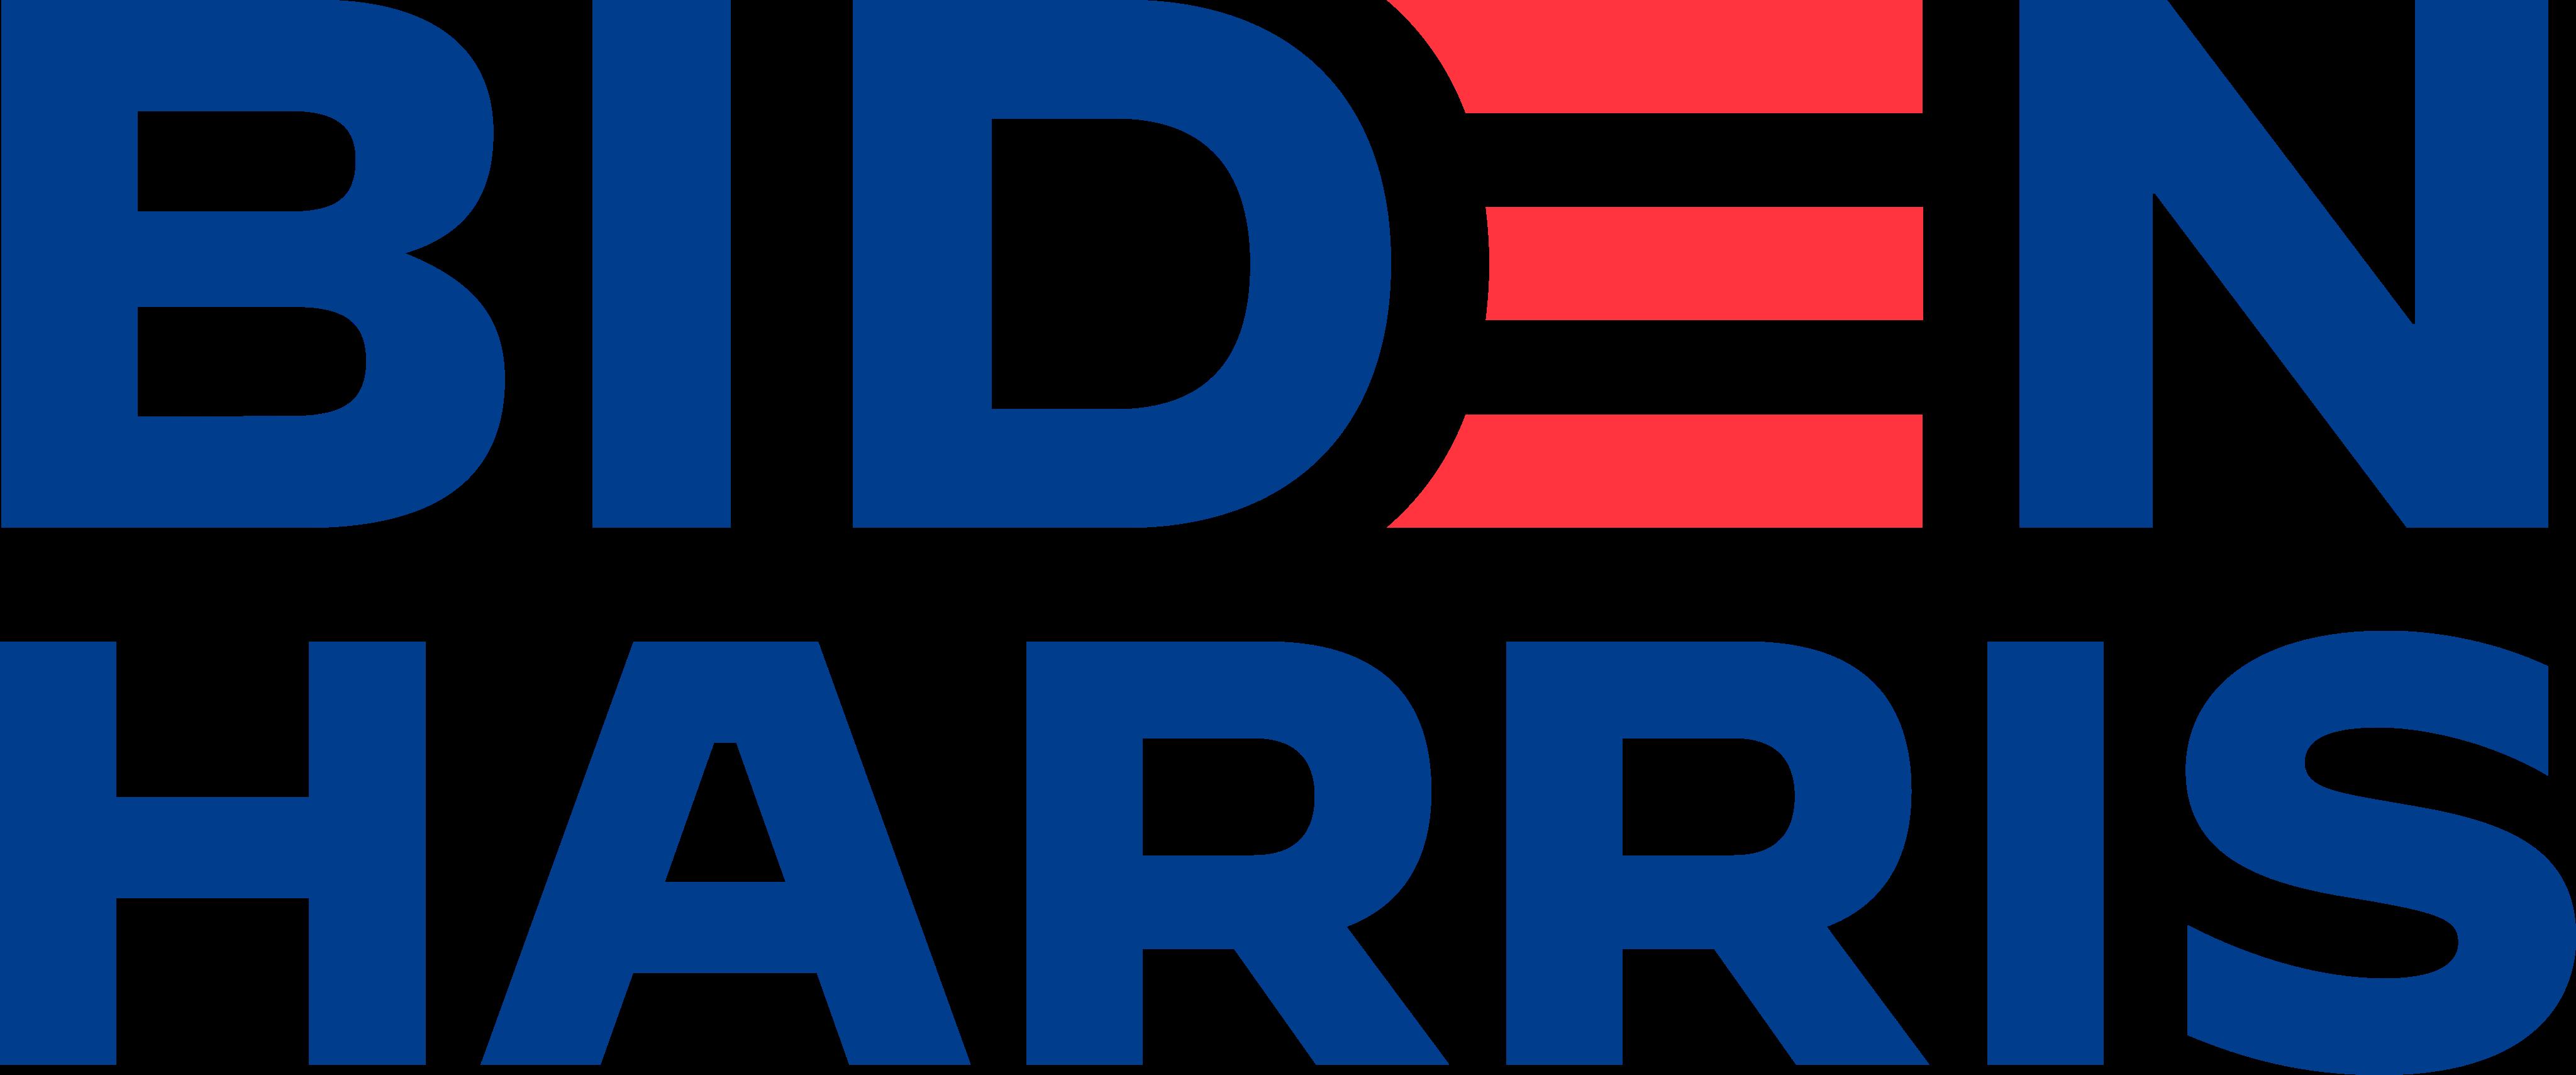 joe biden harris 2020 logo - Joe Biden 2020 President Logo